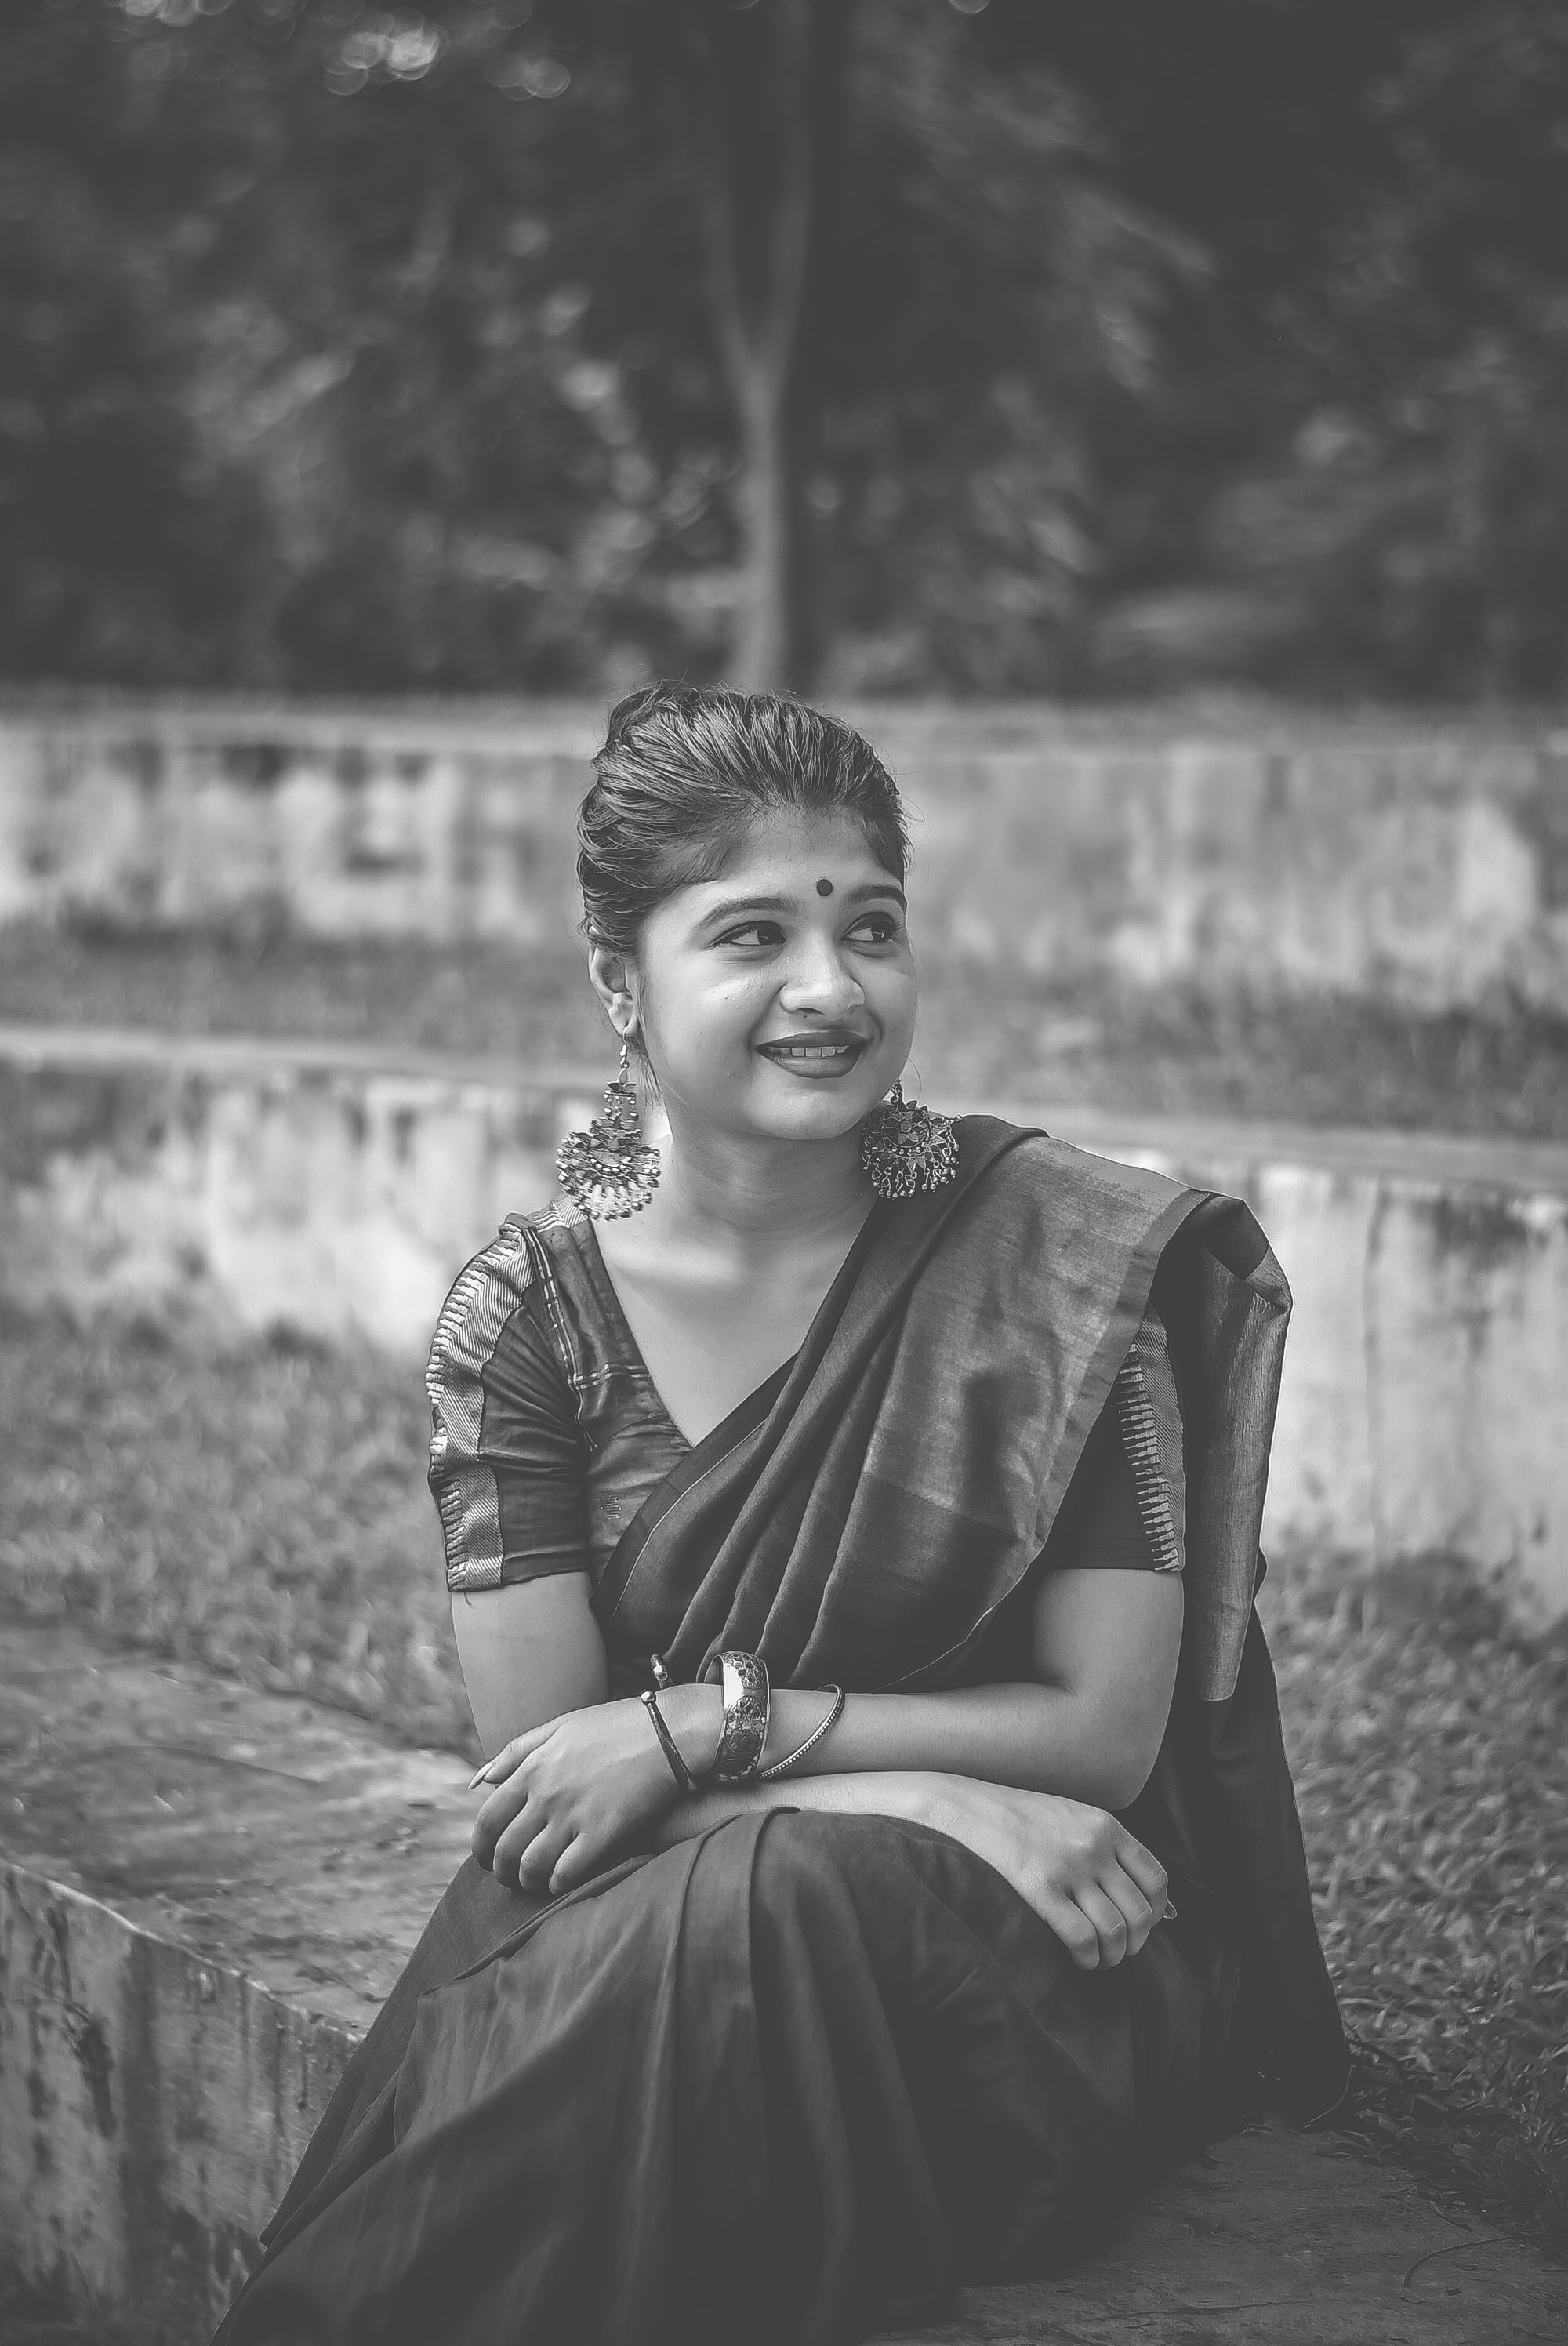 Image by Arindam Deb